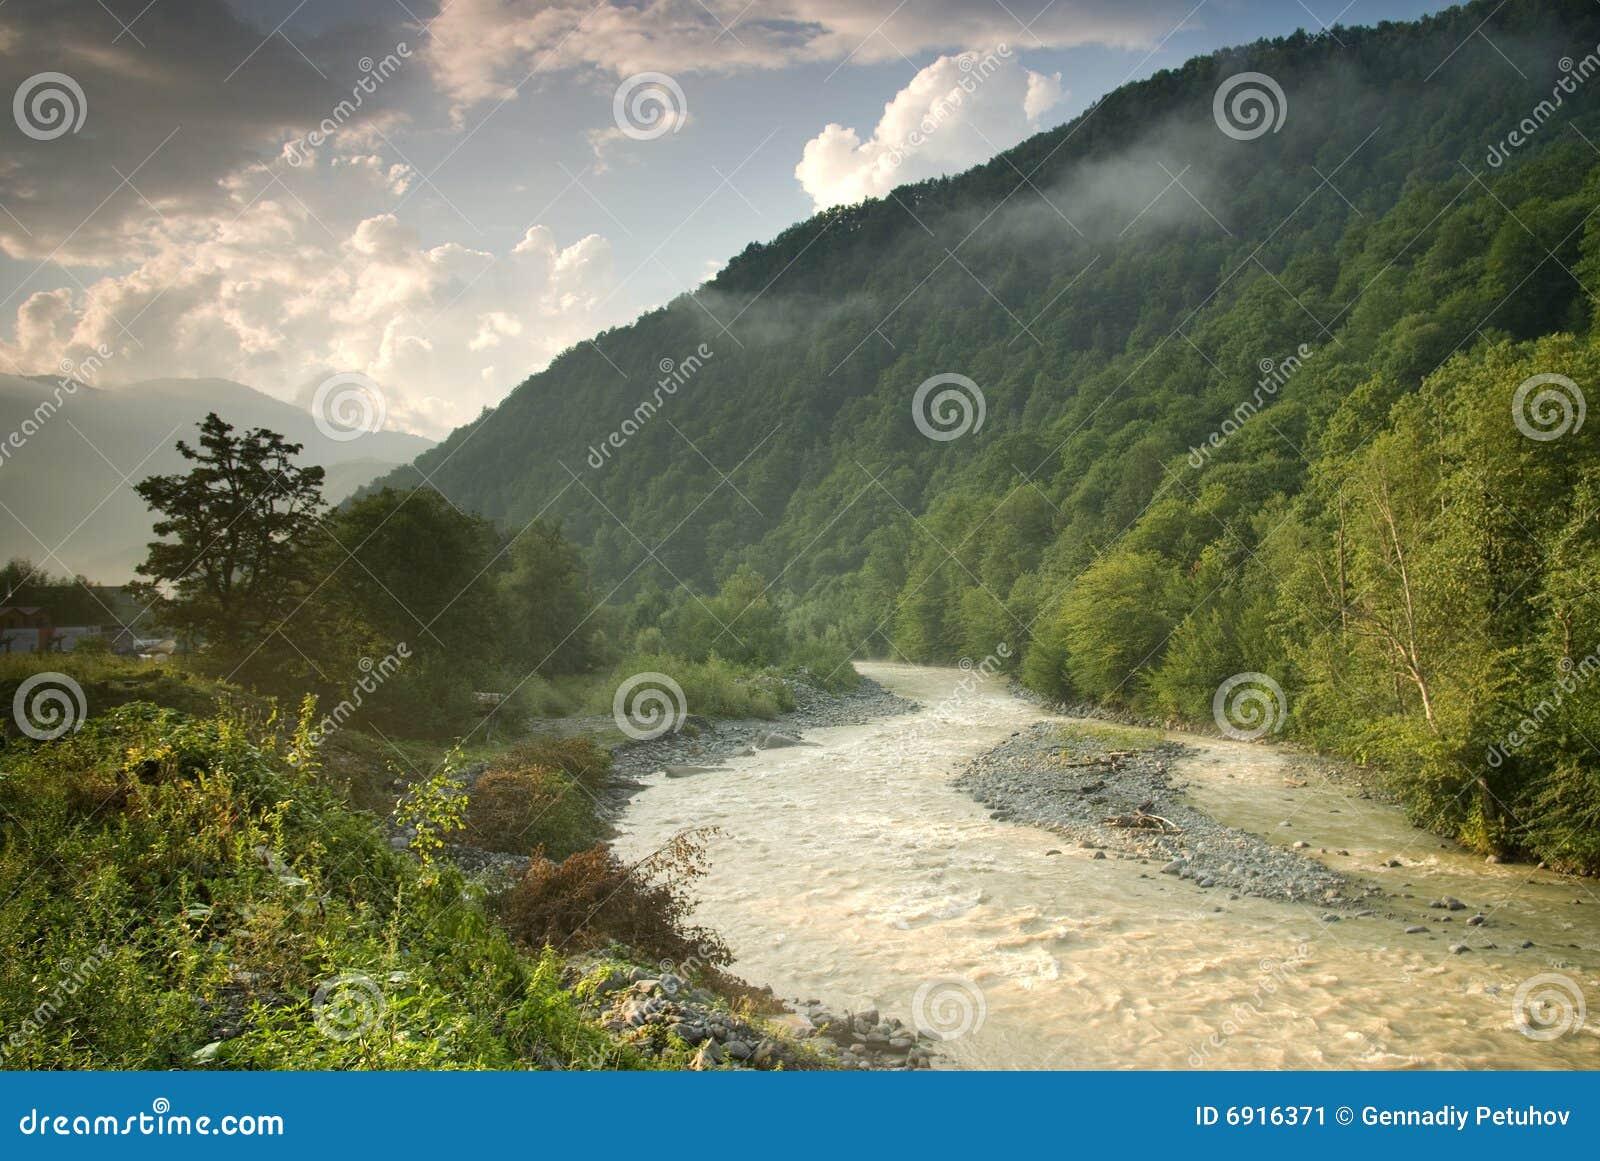 Mzymta river in Krasnaya Polyana